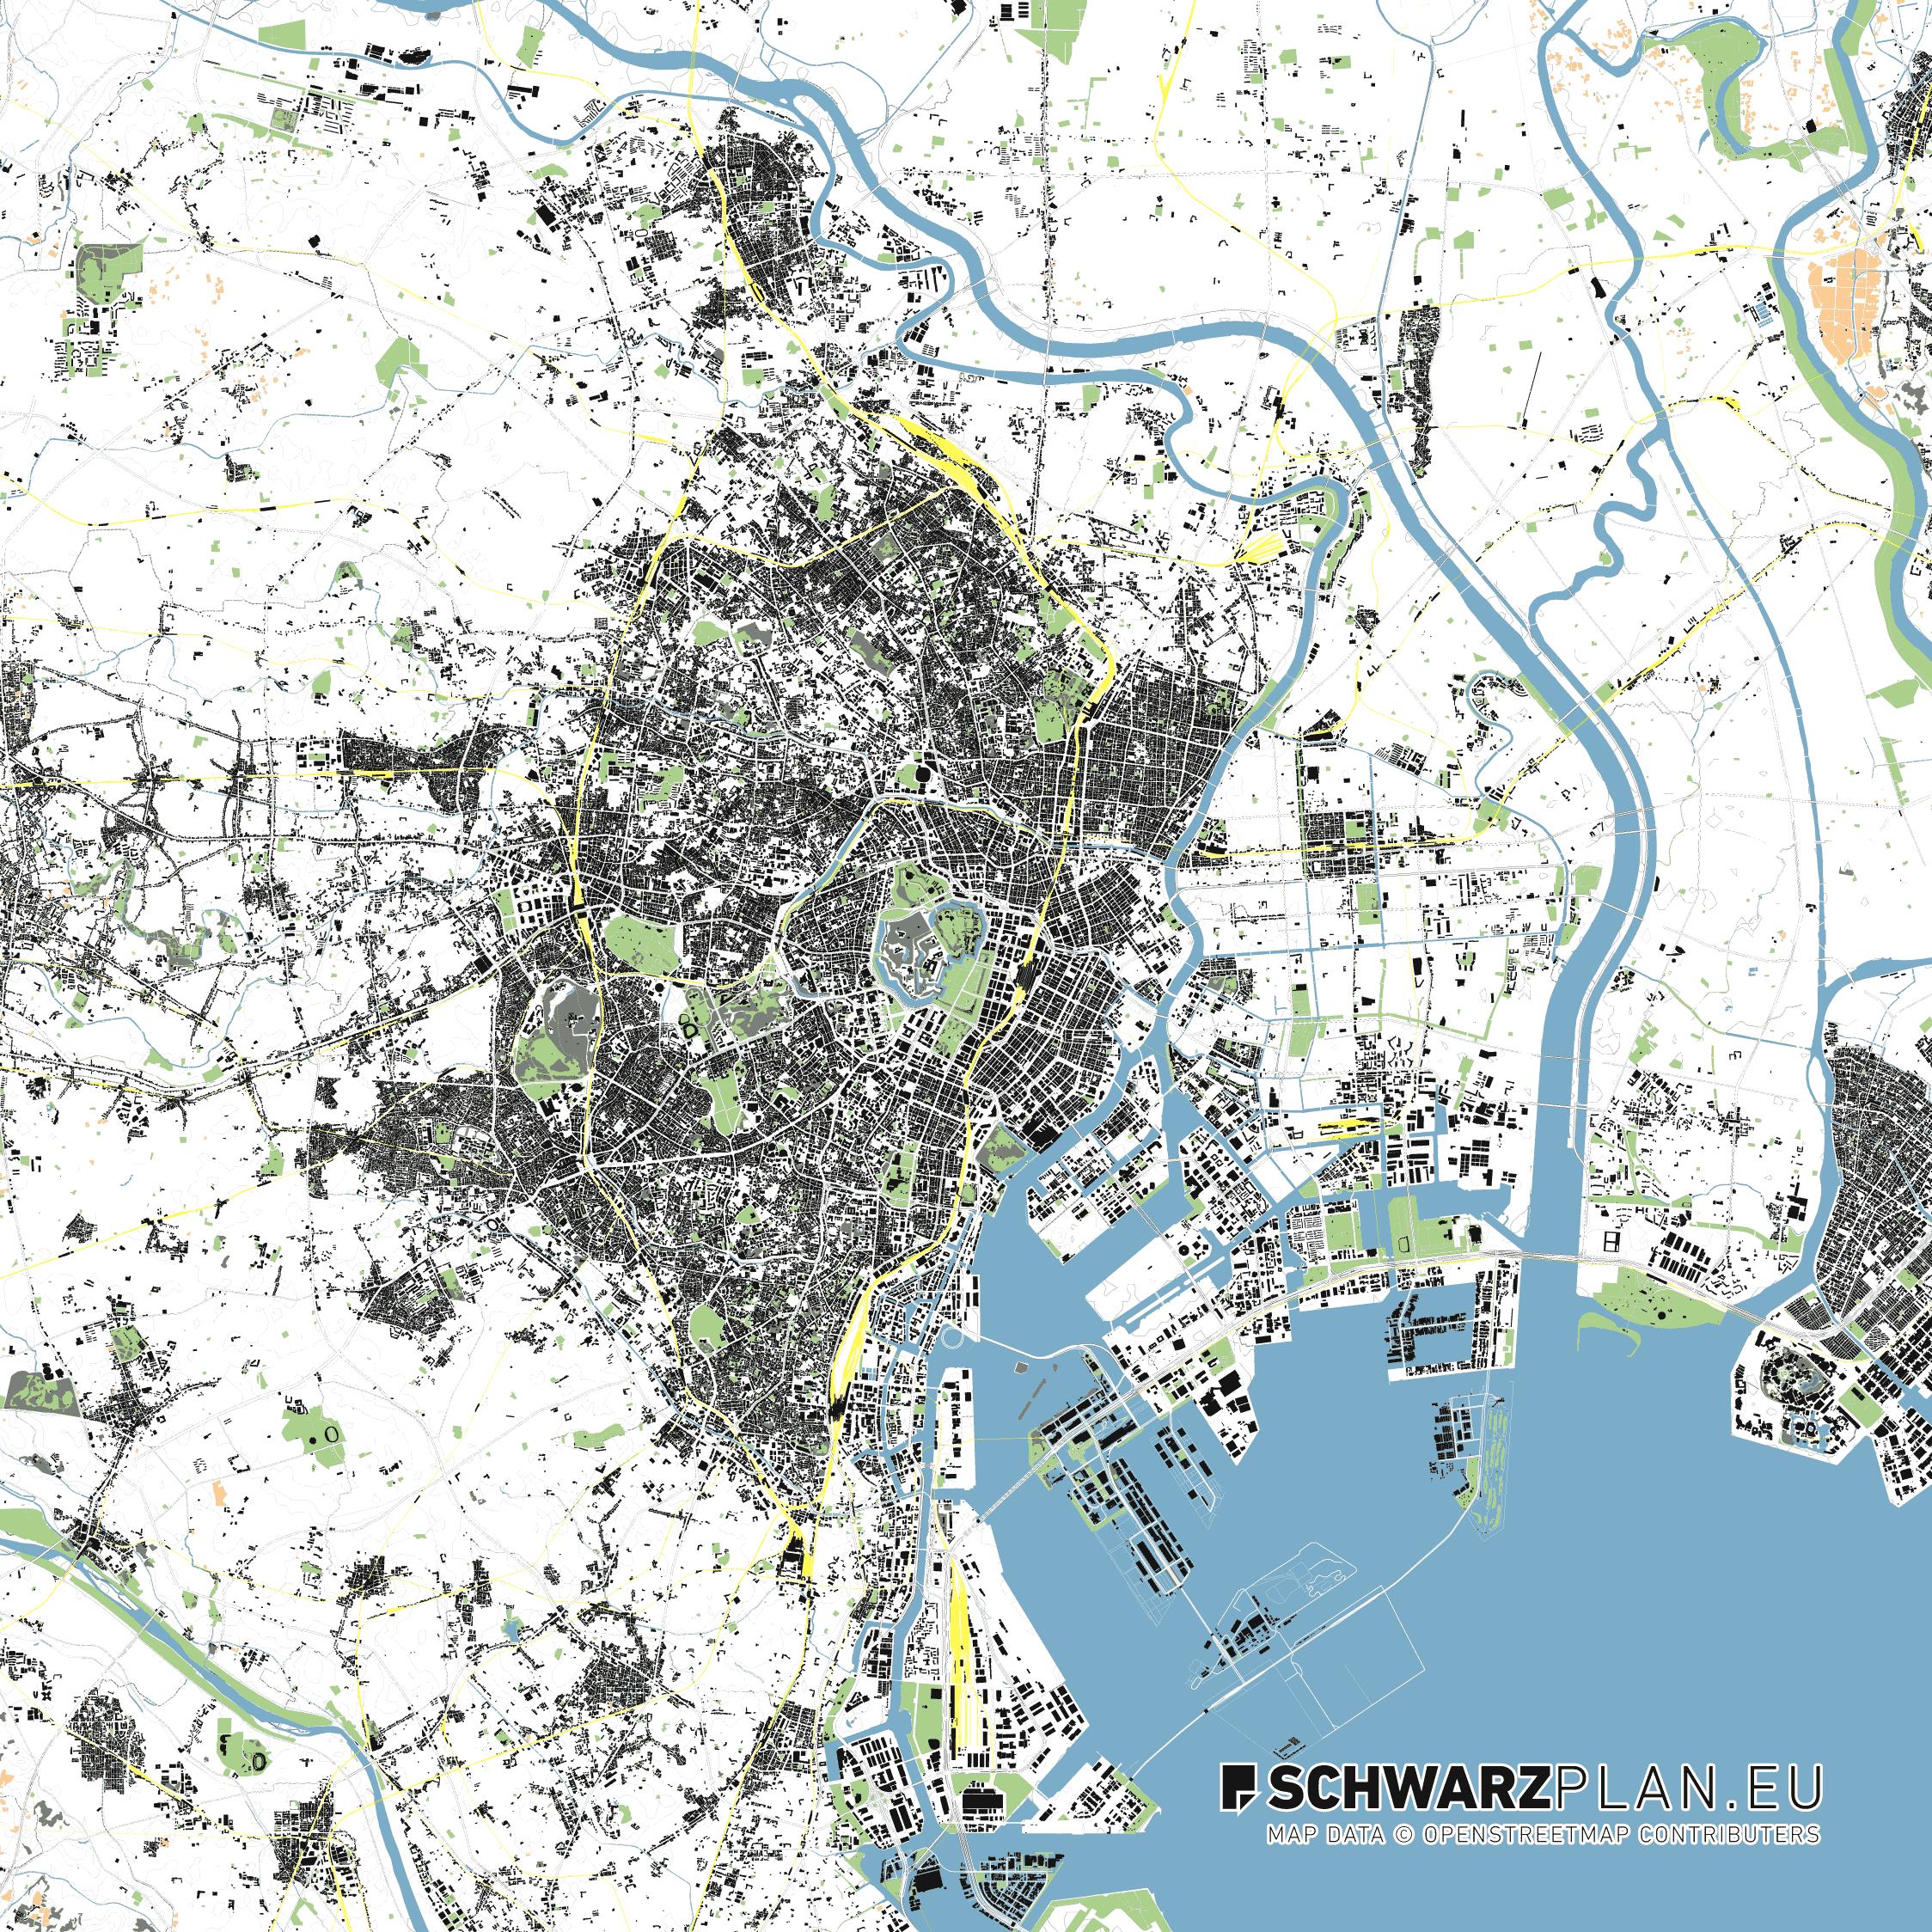 Site plan figure ground plan of tokyo for download as pdf lageplan von tokio in japan gumiabroncs Image collections